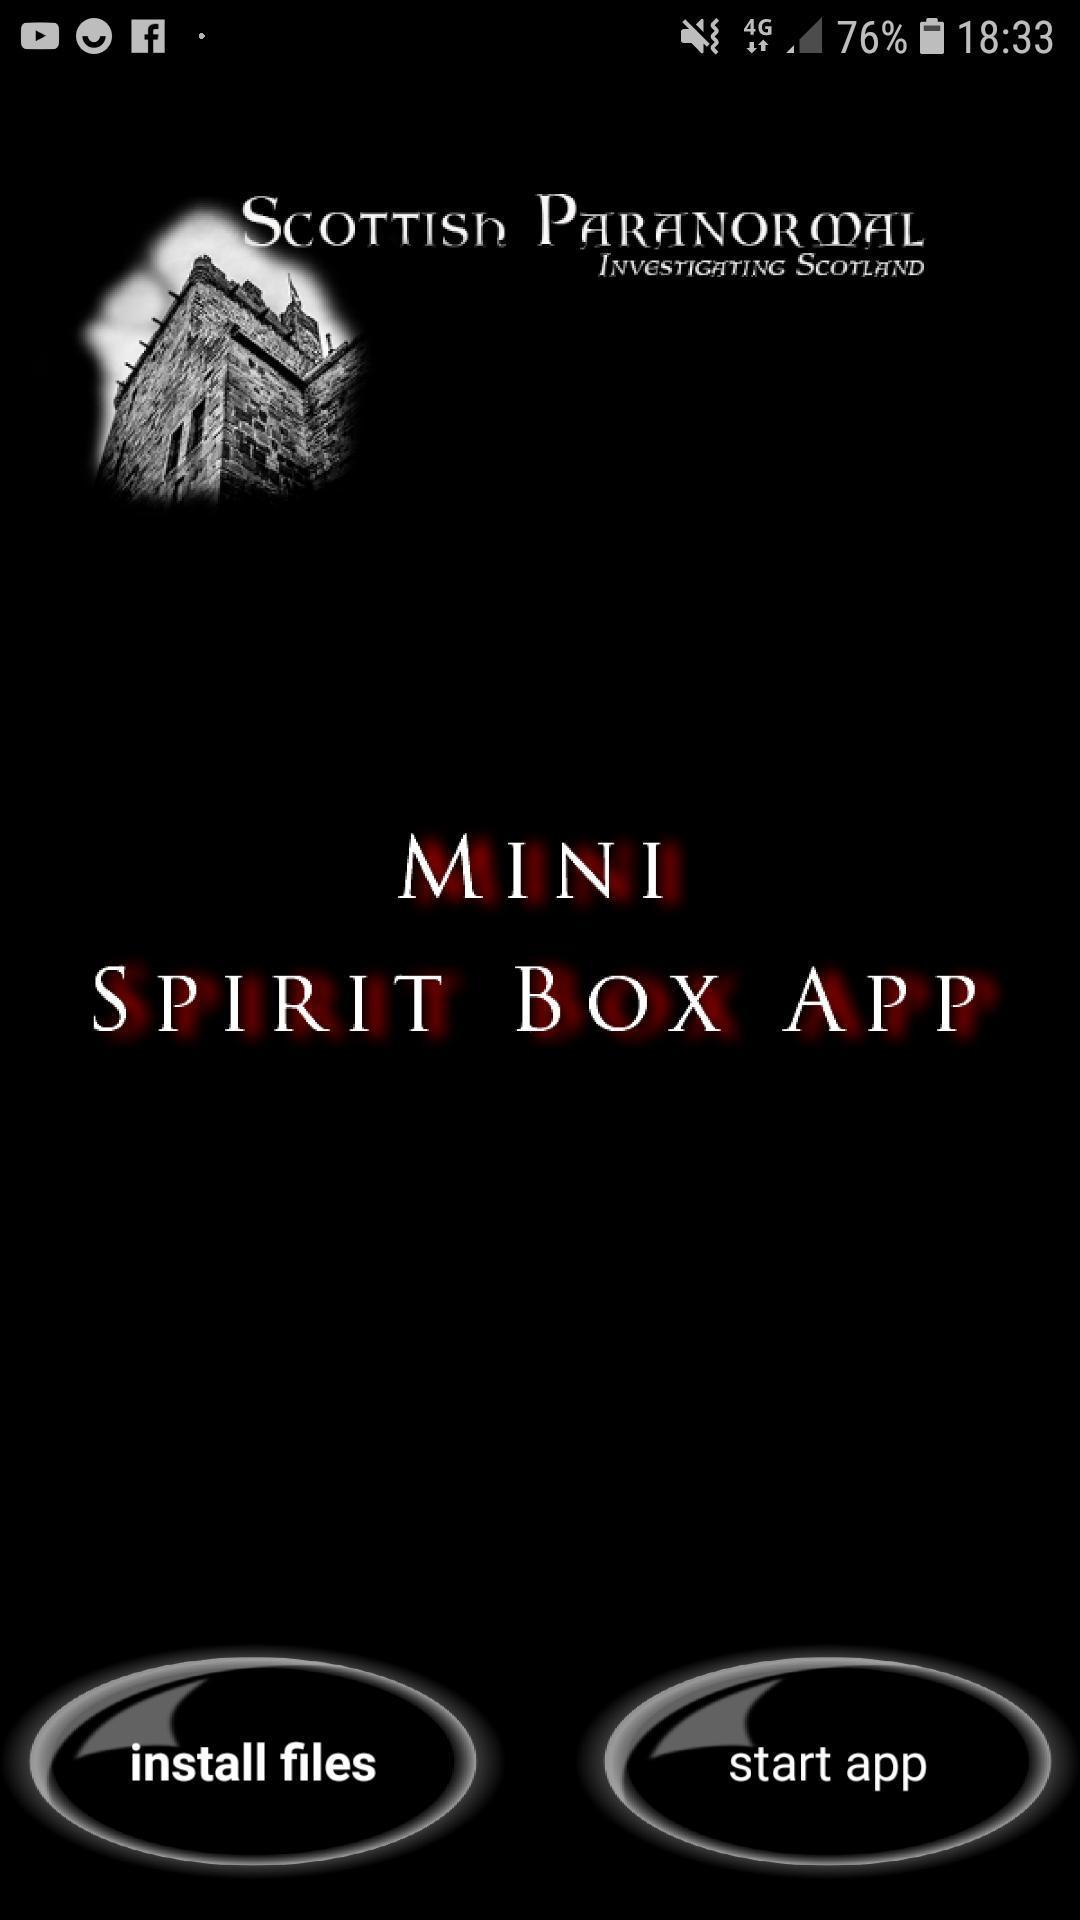 SP Mini Spirit Box App for Android - APK Download